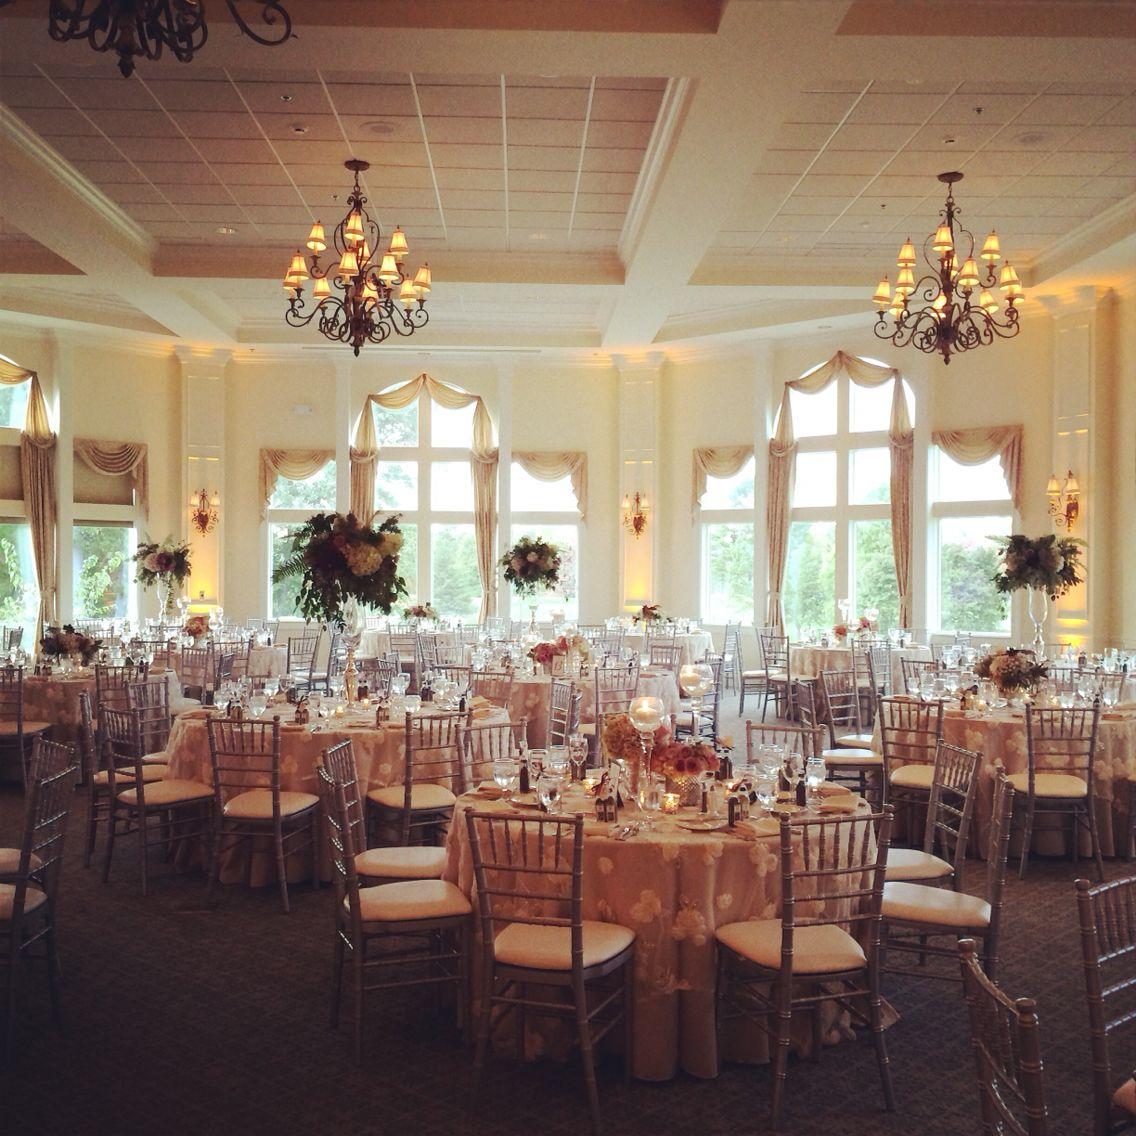 Country Wedding Reception Ideas: Irondequoit Country Club Ballroom